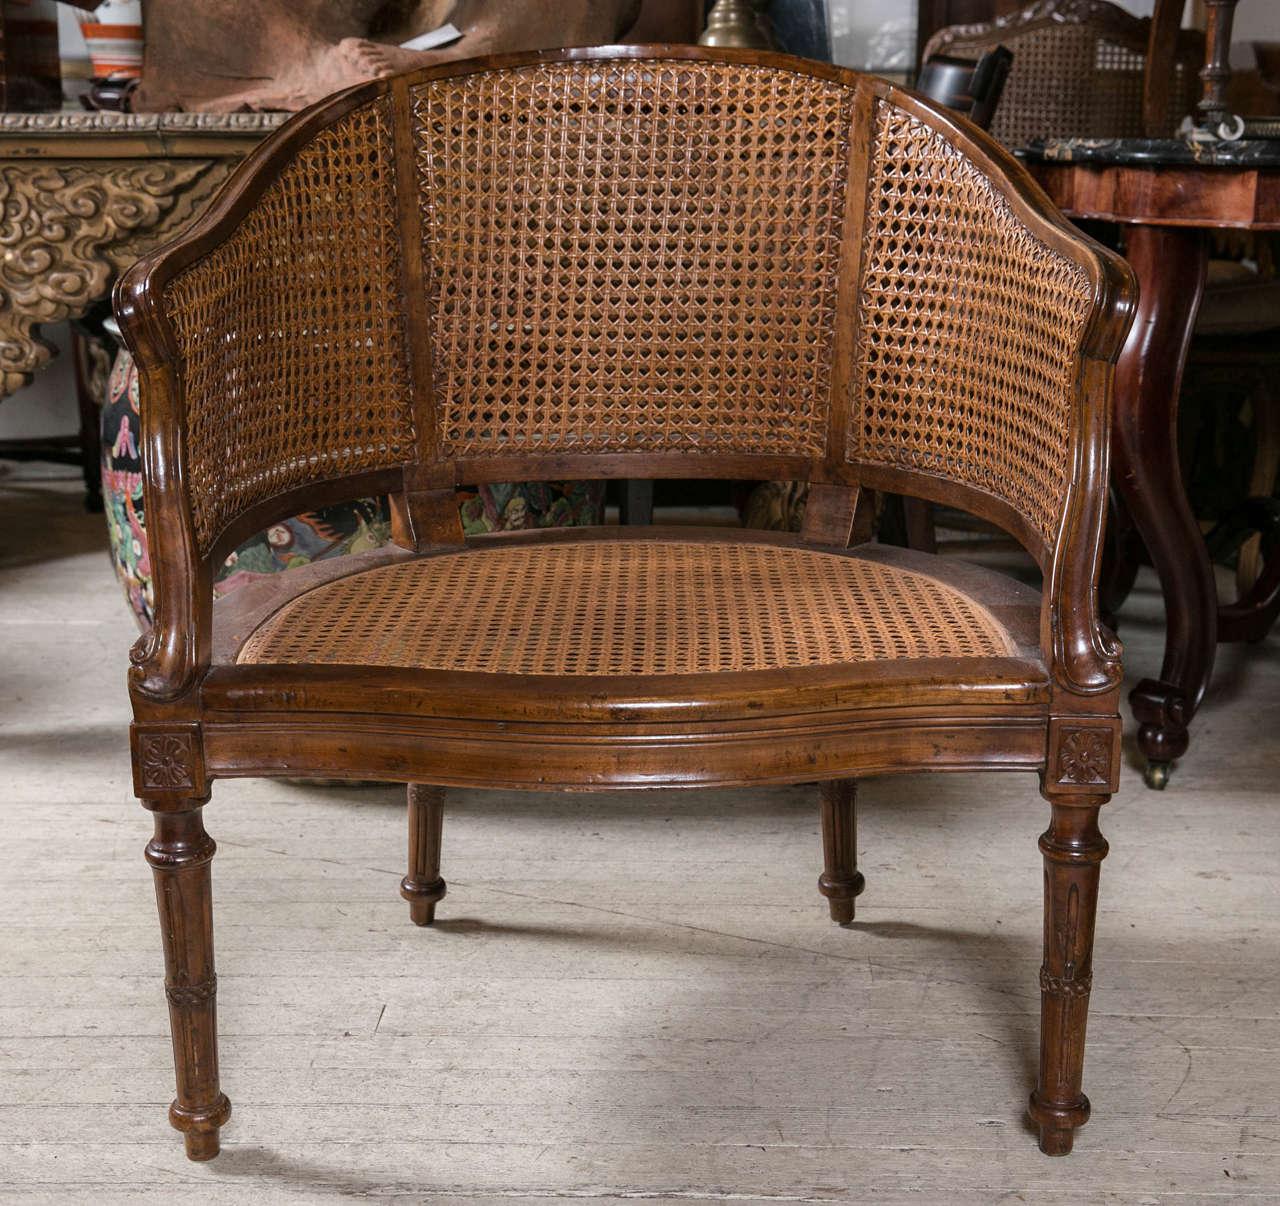 Antique louis xvi chair - Antique Louis Xvi Caned Desk Chair 2